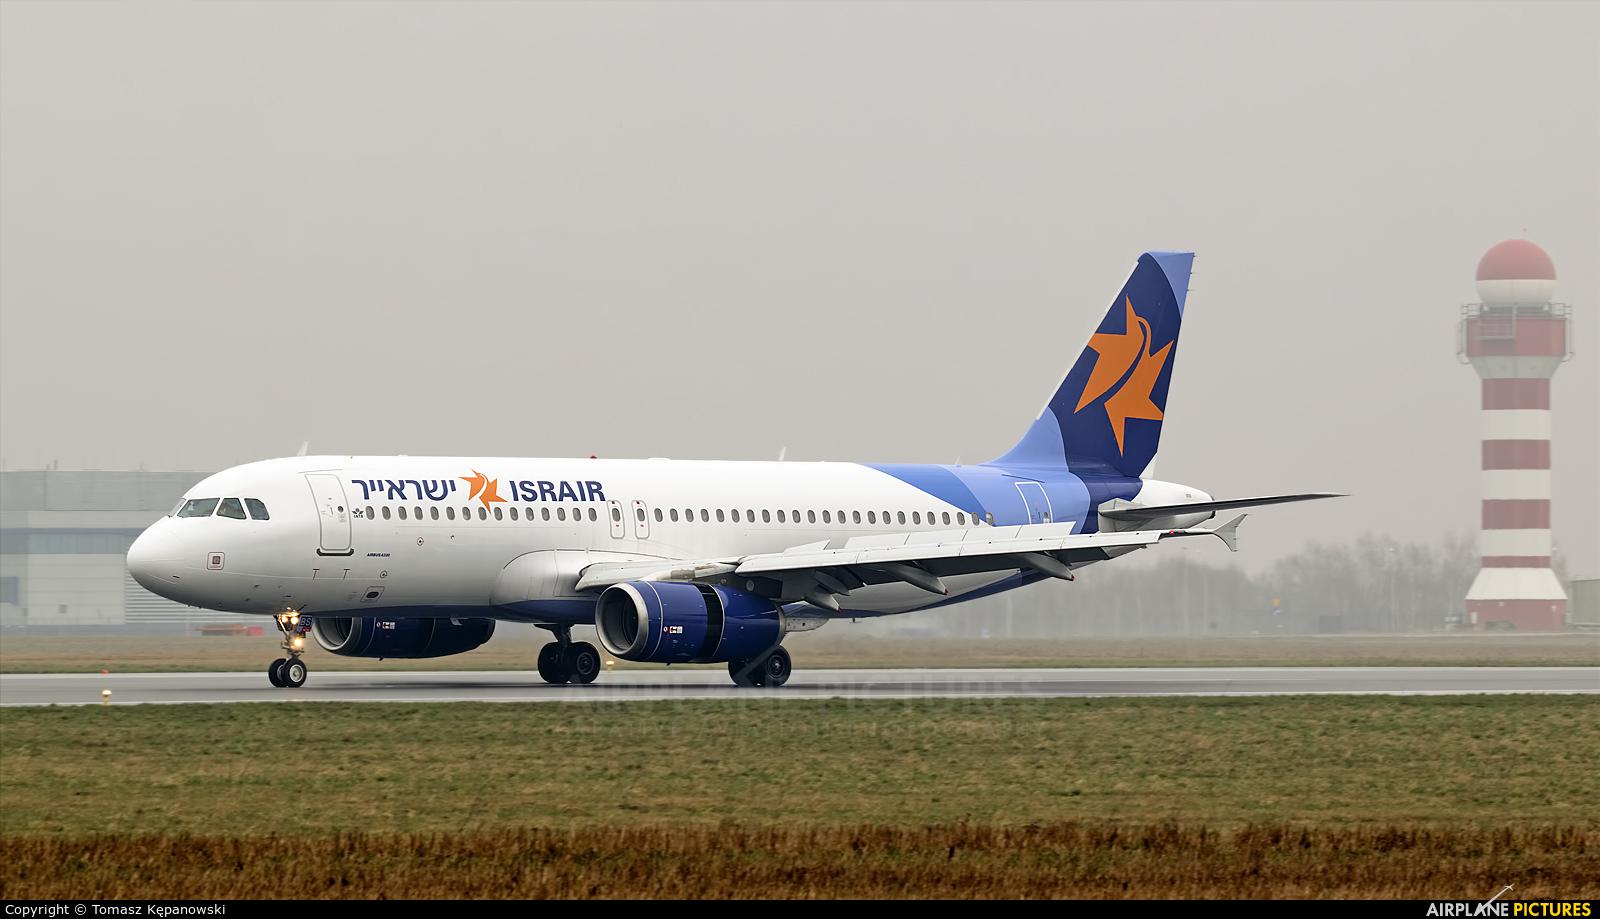 Israir Airlines 4X-ABS aircraft at Rzeszów-Jasionka